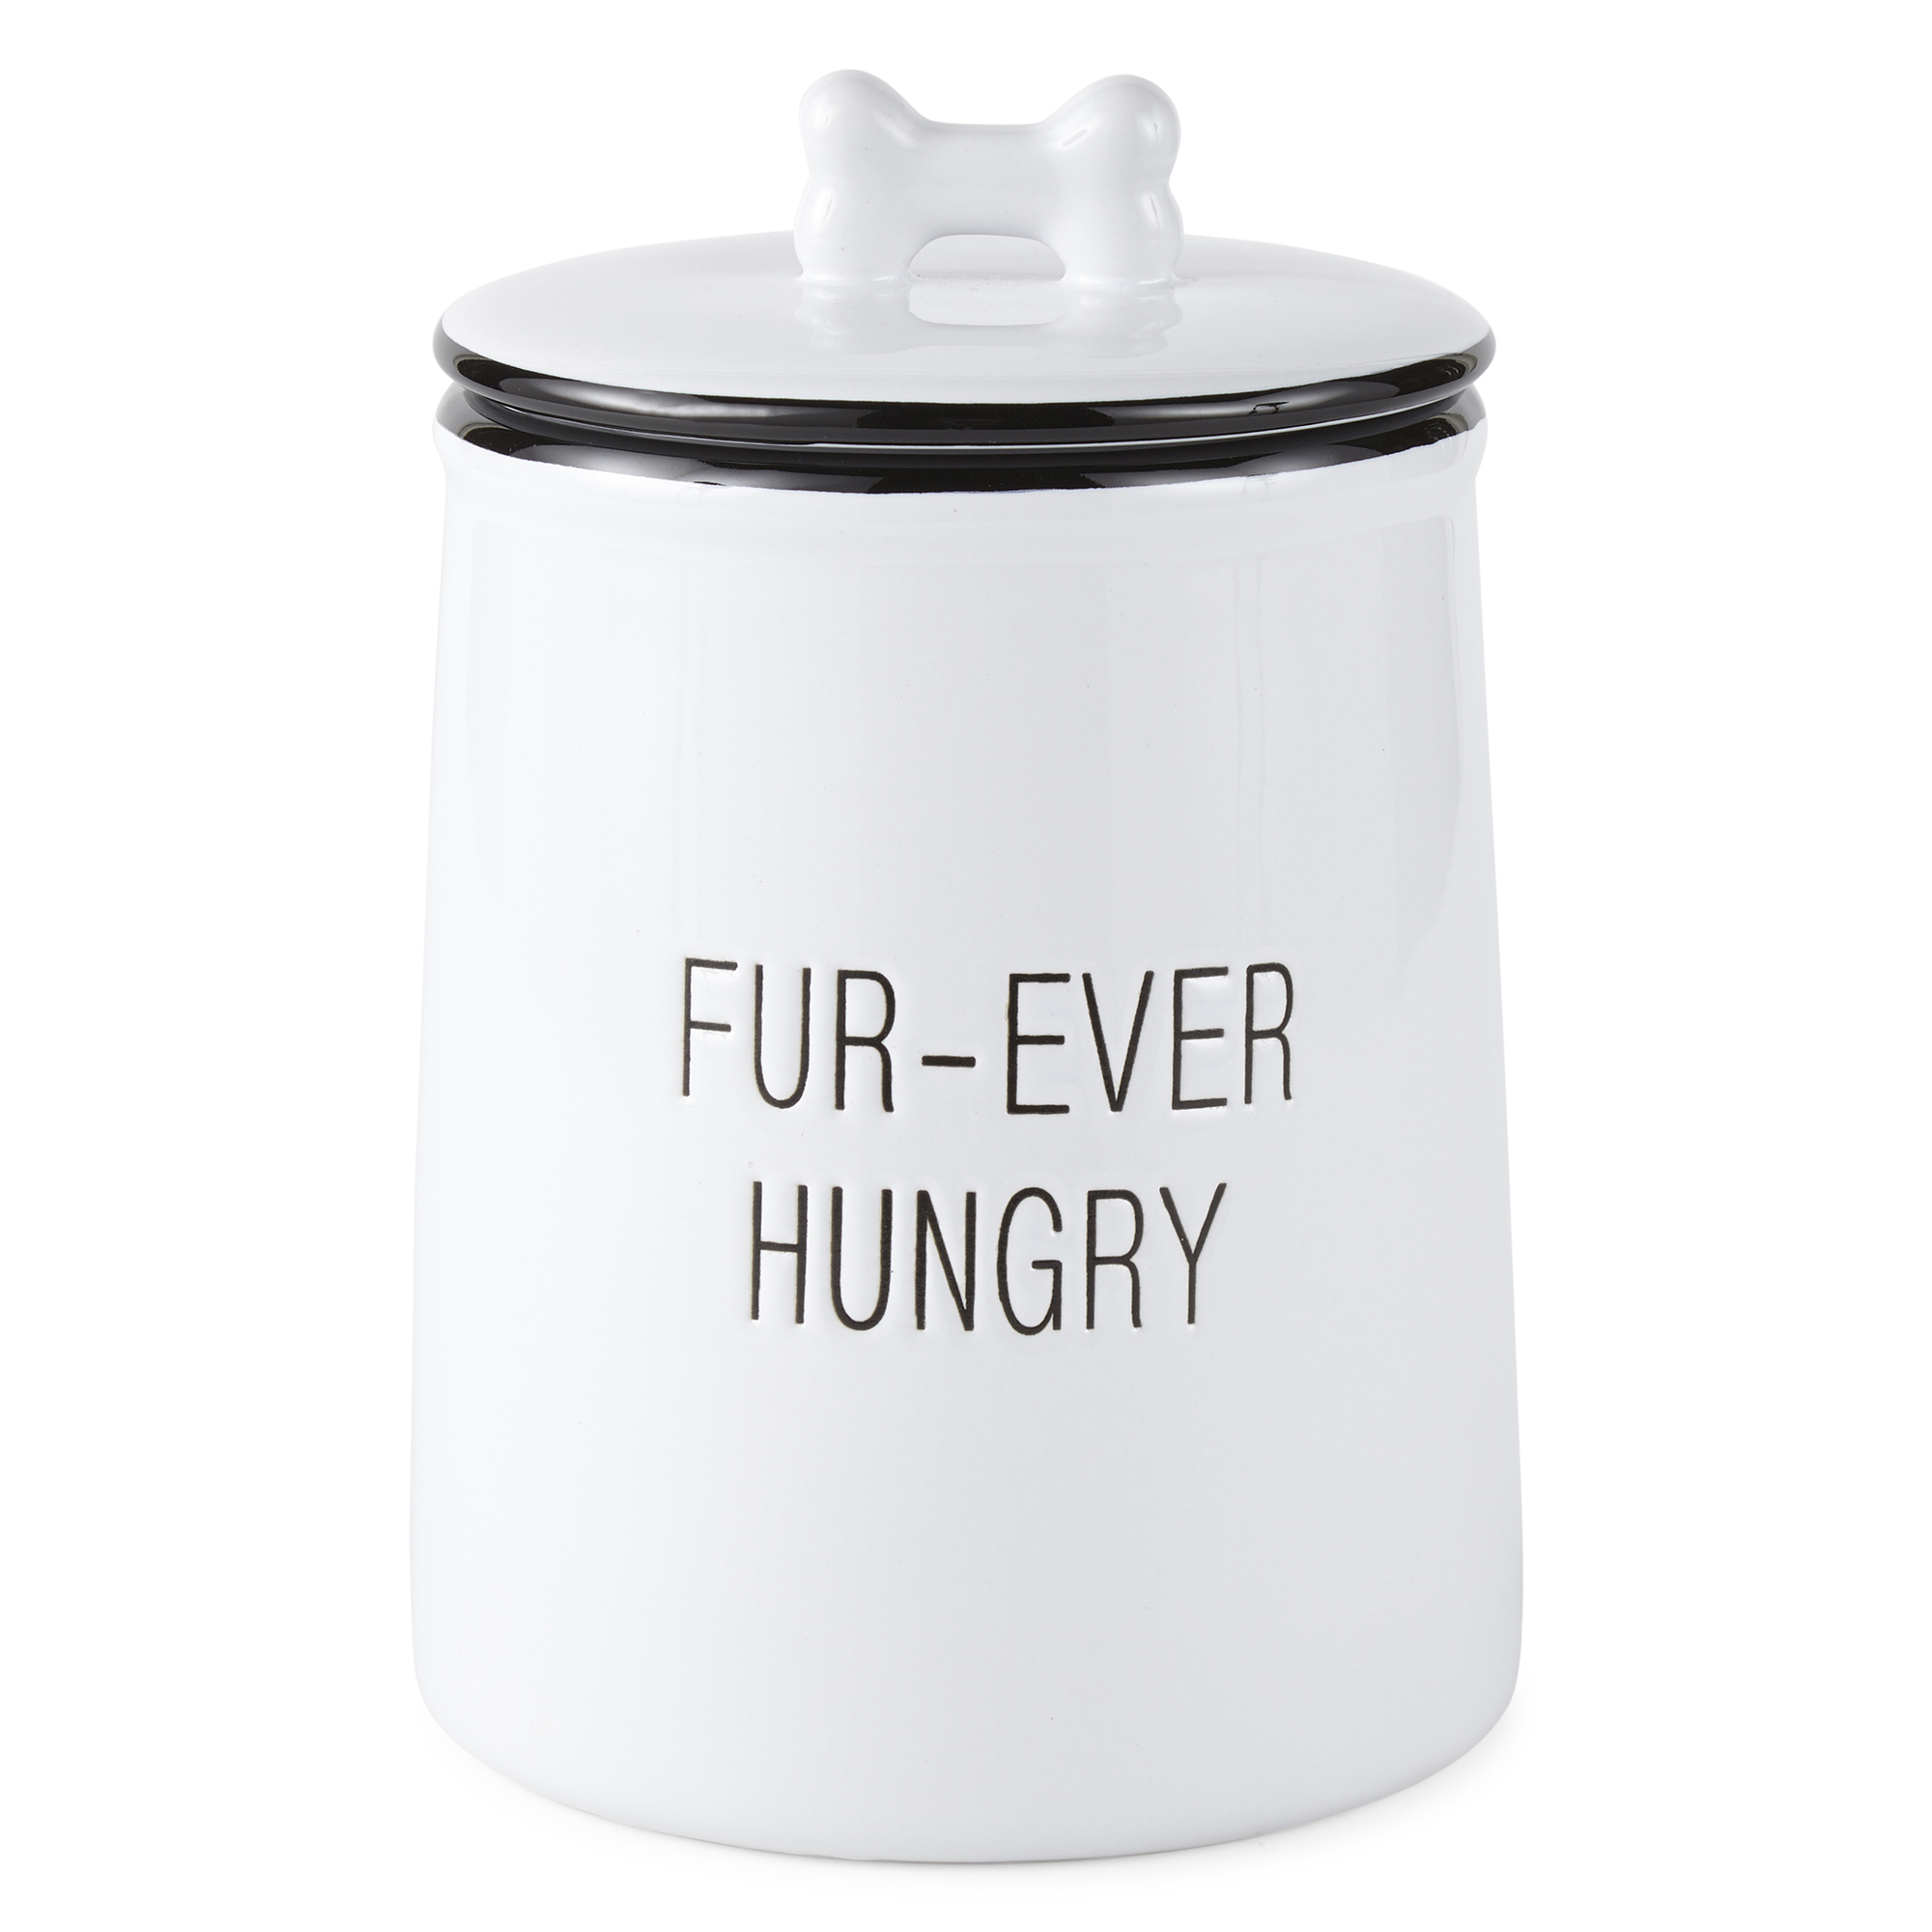 PAW & TAIL FUR-EVER HUNGRY Treat Jar